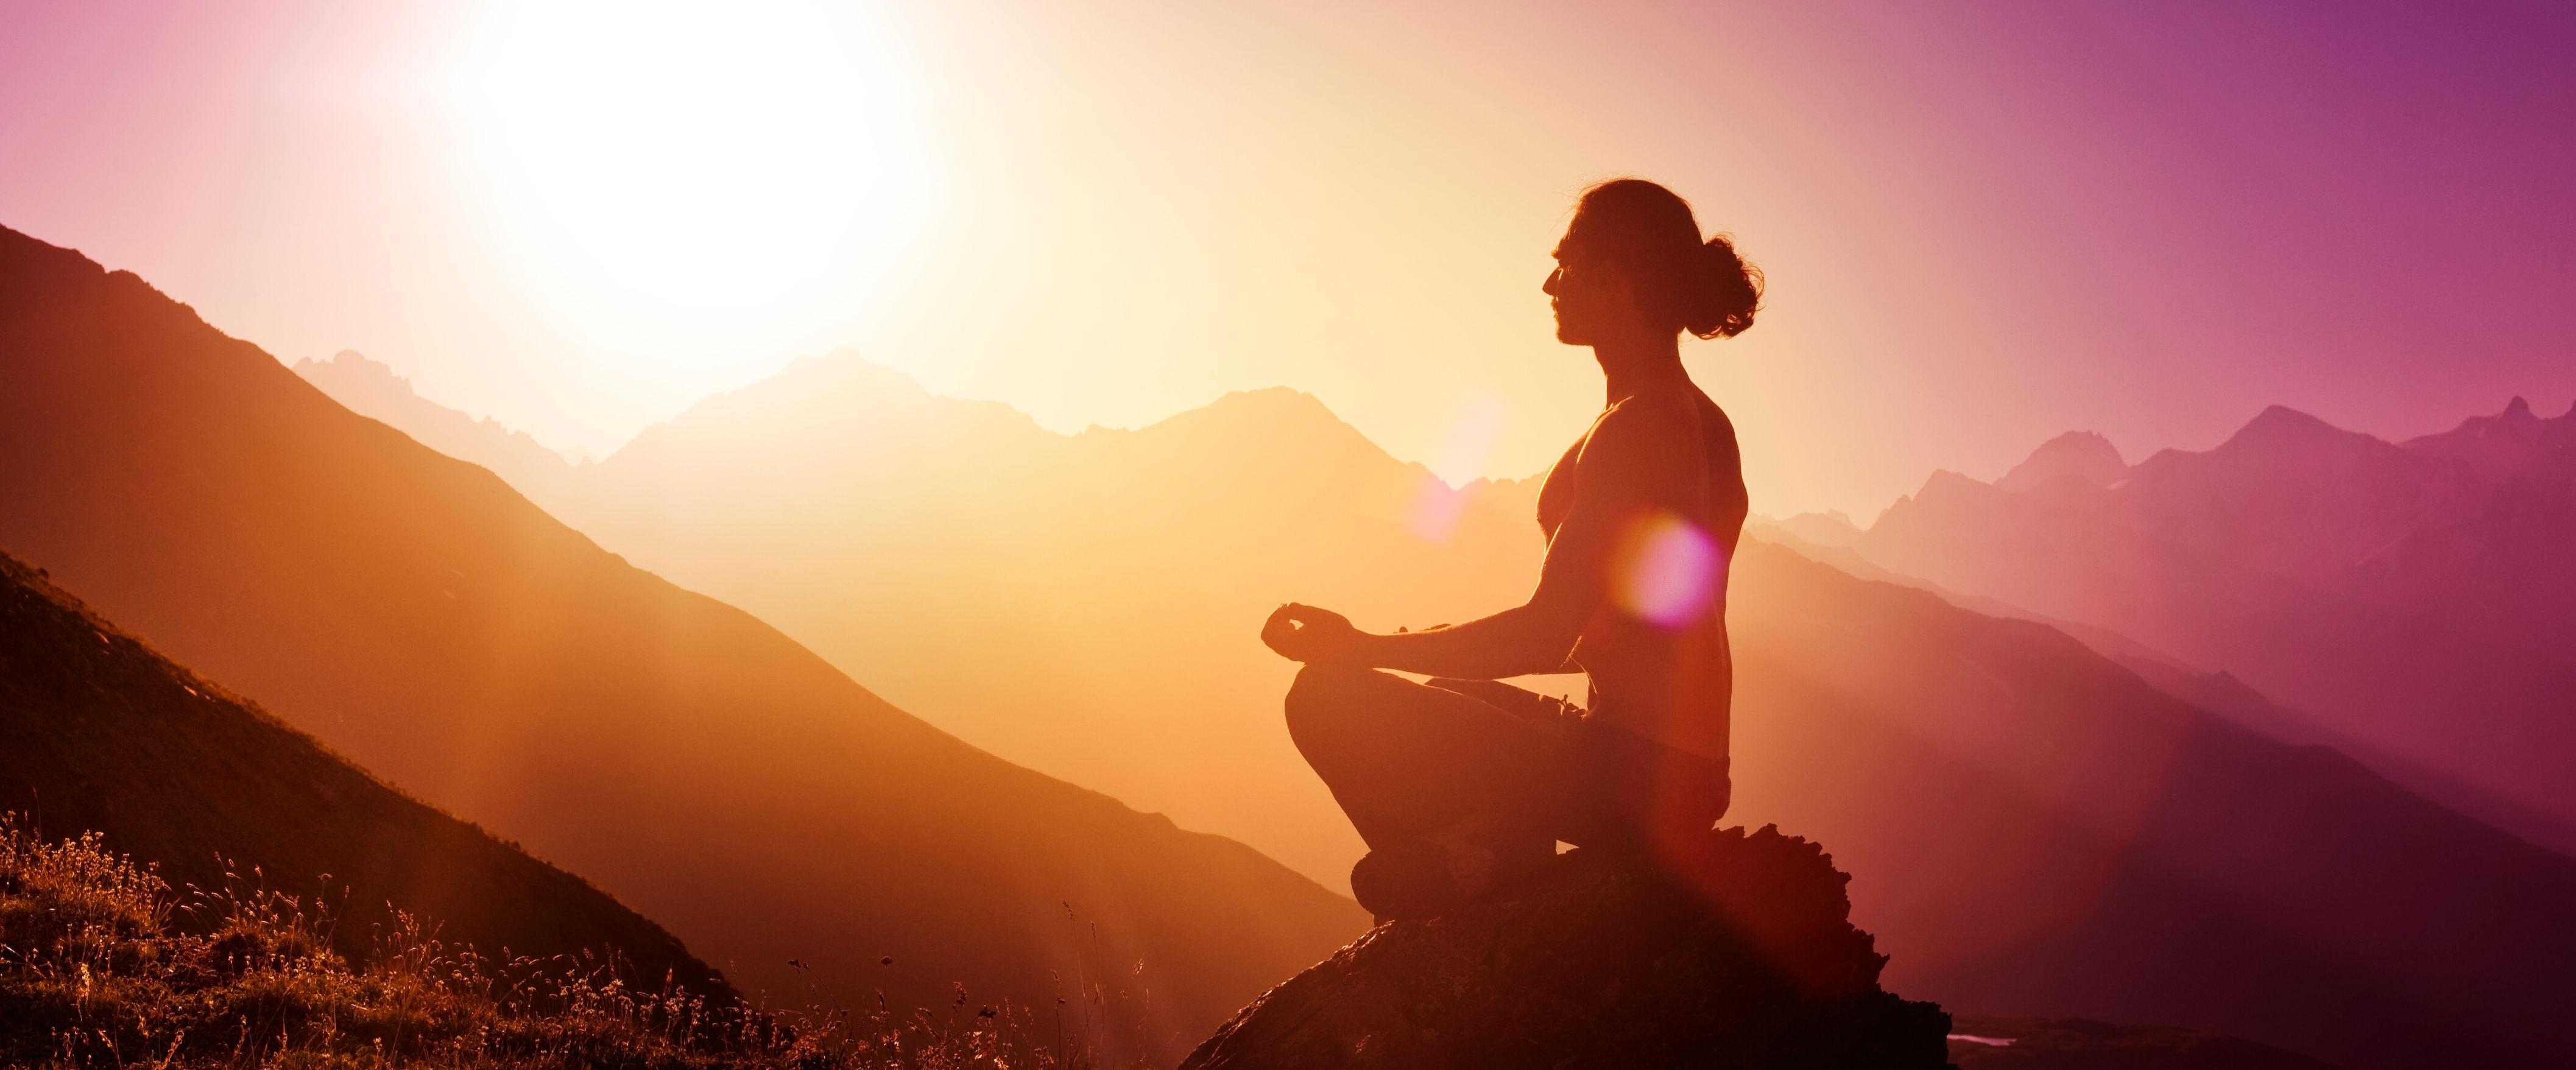 Get stress free the pranayama way!